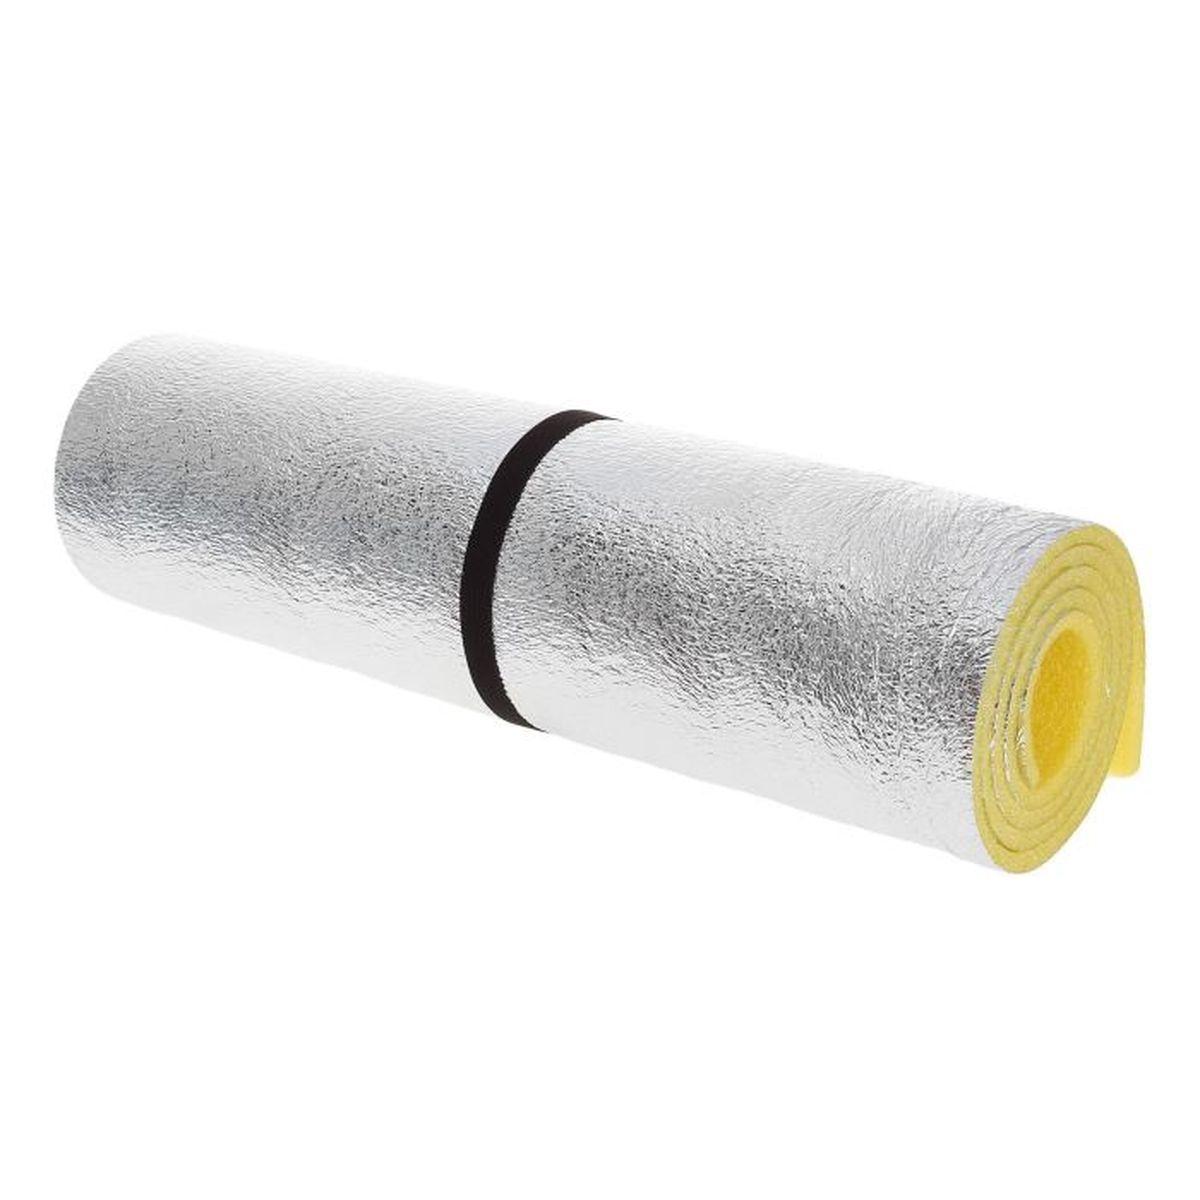 Коврик туристичекский, цвет: желтый, фольга, 180 х 60 х 1 см - Подушки, пледы, коврики